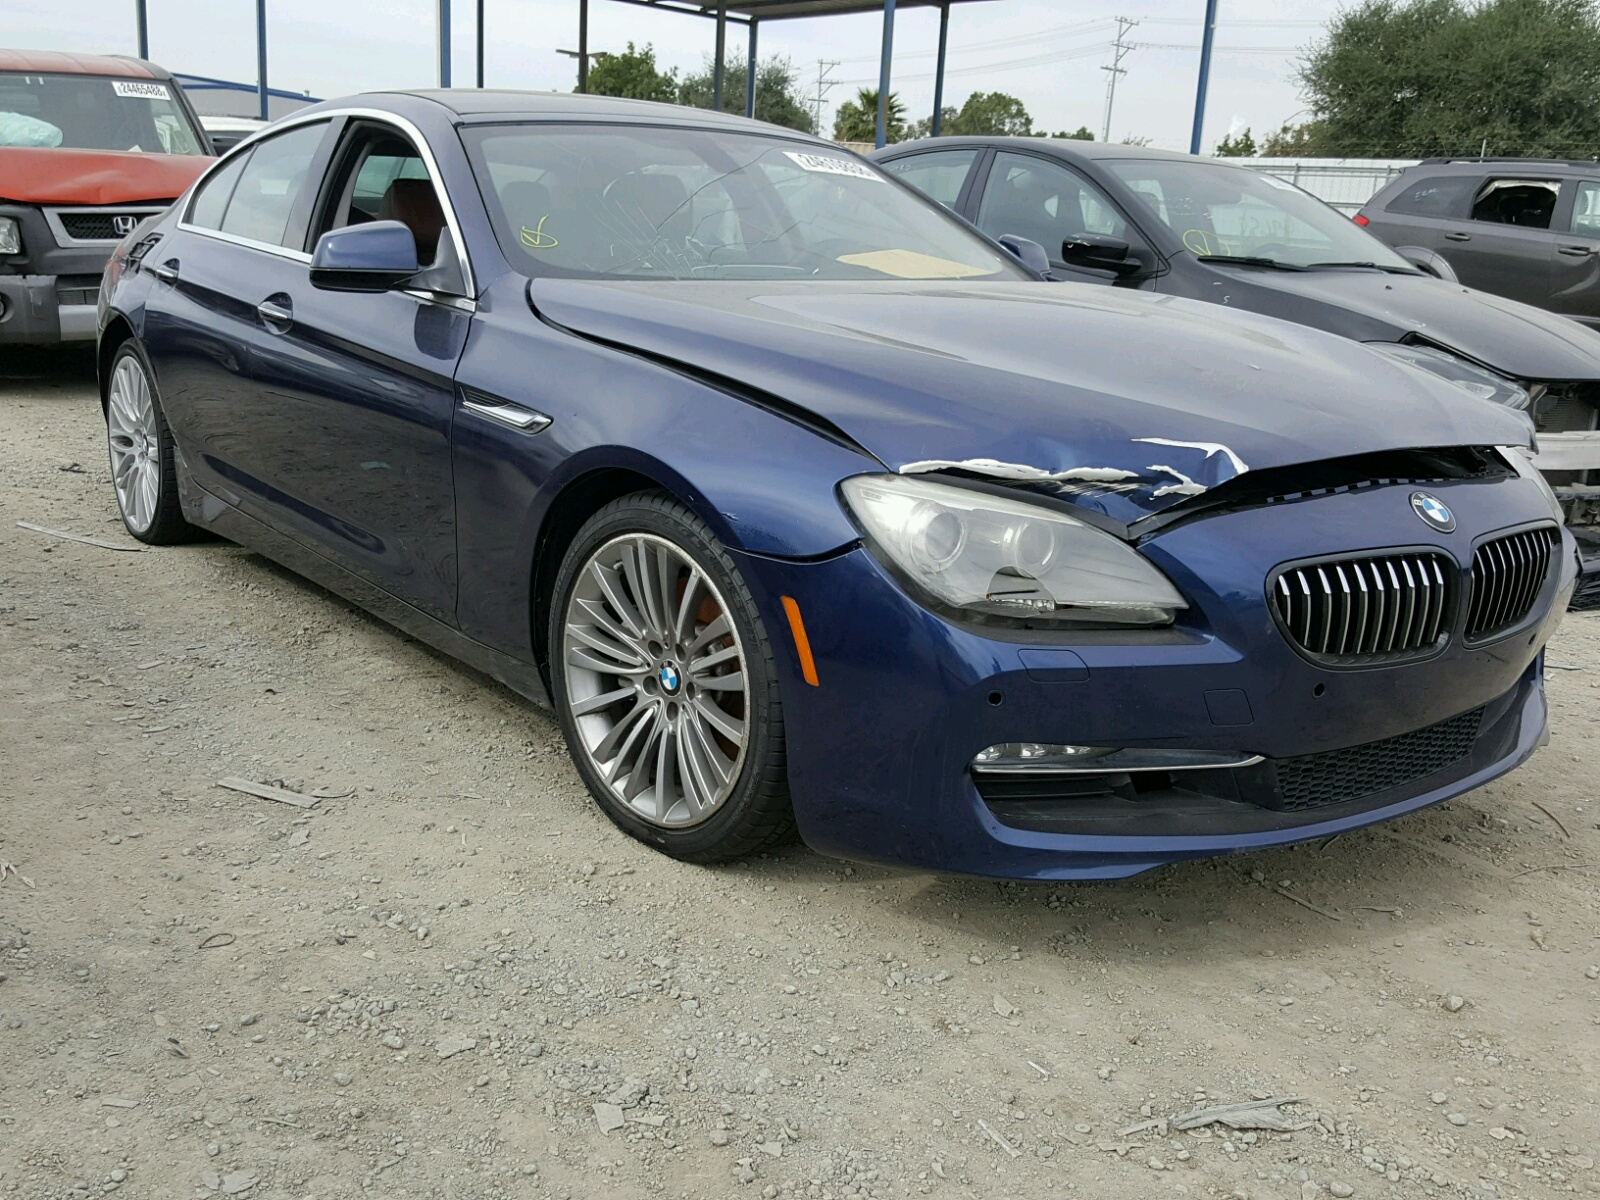 WBABCED BLUE BMW I On Sale In CA SAN DIEGO - 2014 bmw 650